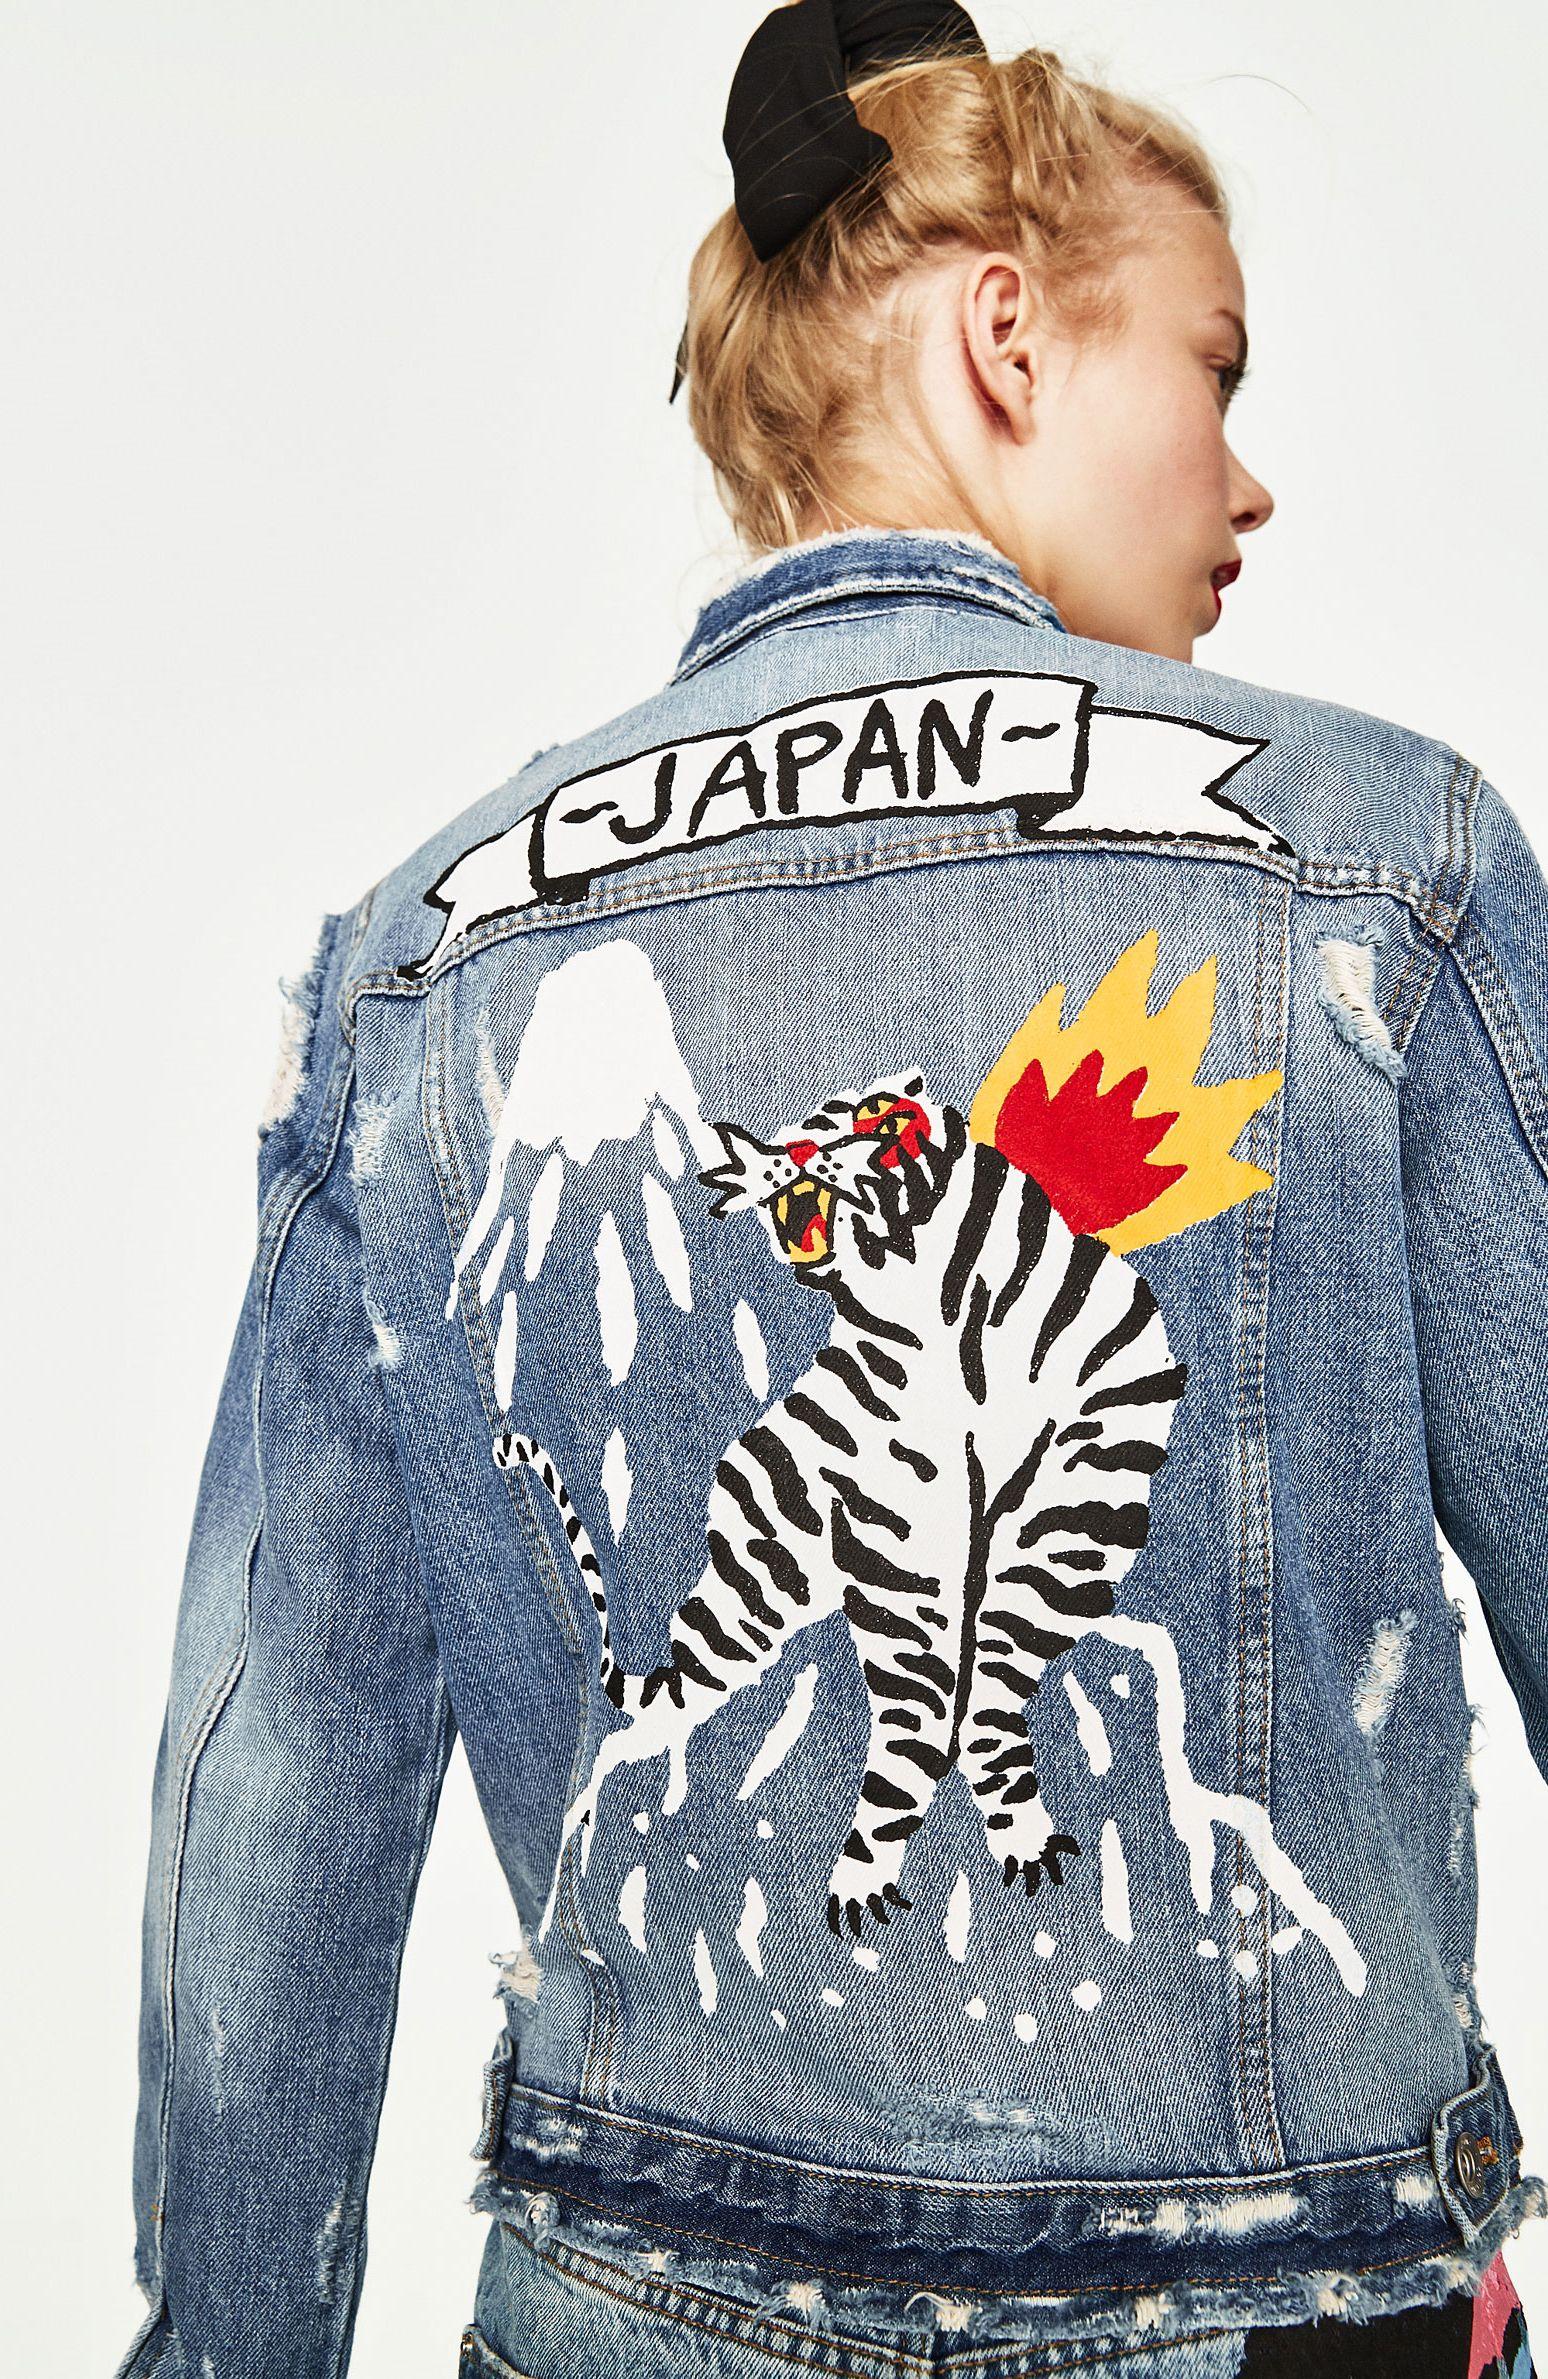 4ce7f727c Japan denim jacket by Ricardo Cavolo   Clothes   Painted denim ...